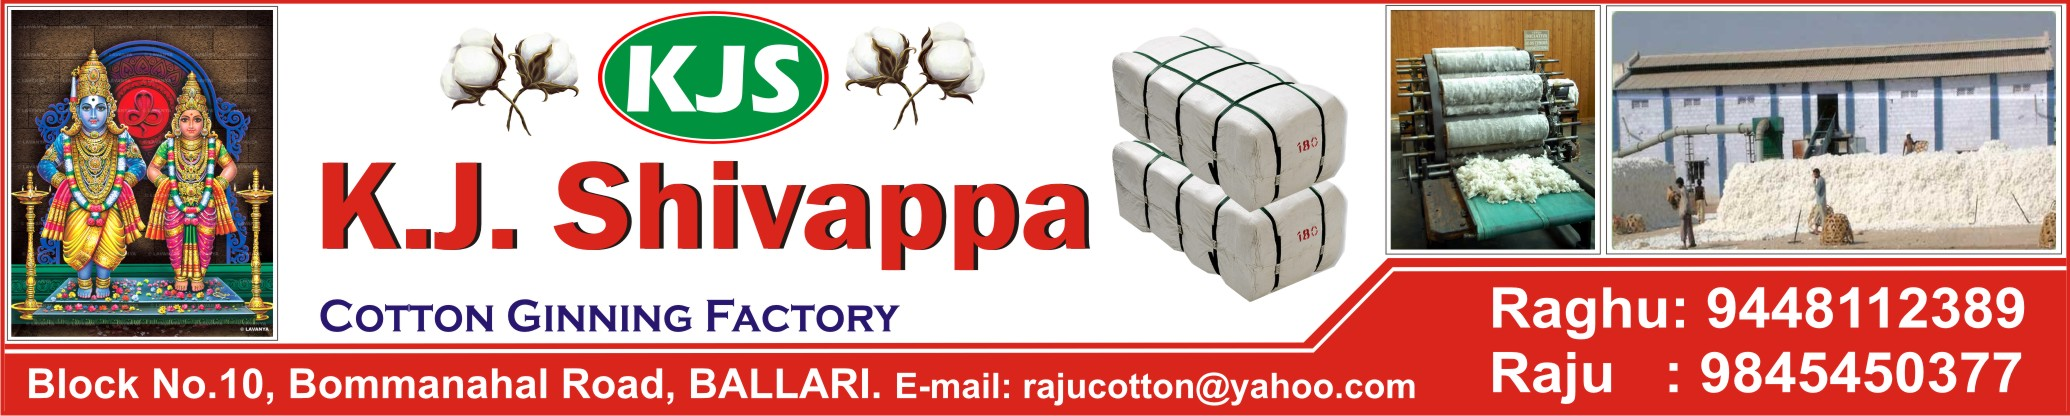 K.J. Shivappa Cotton Ginning Factory